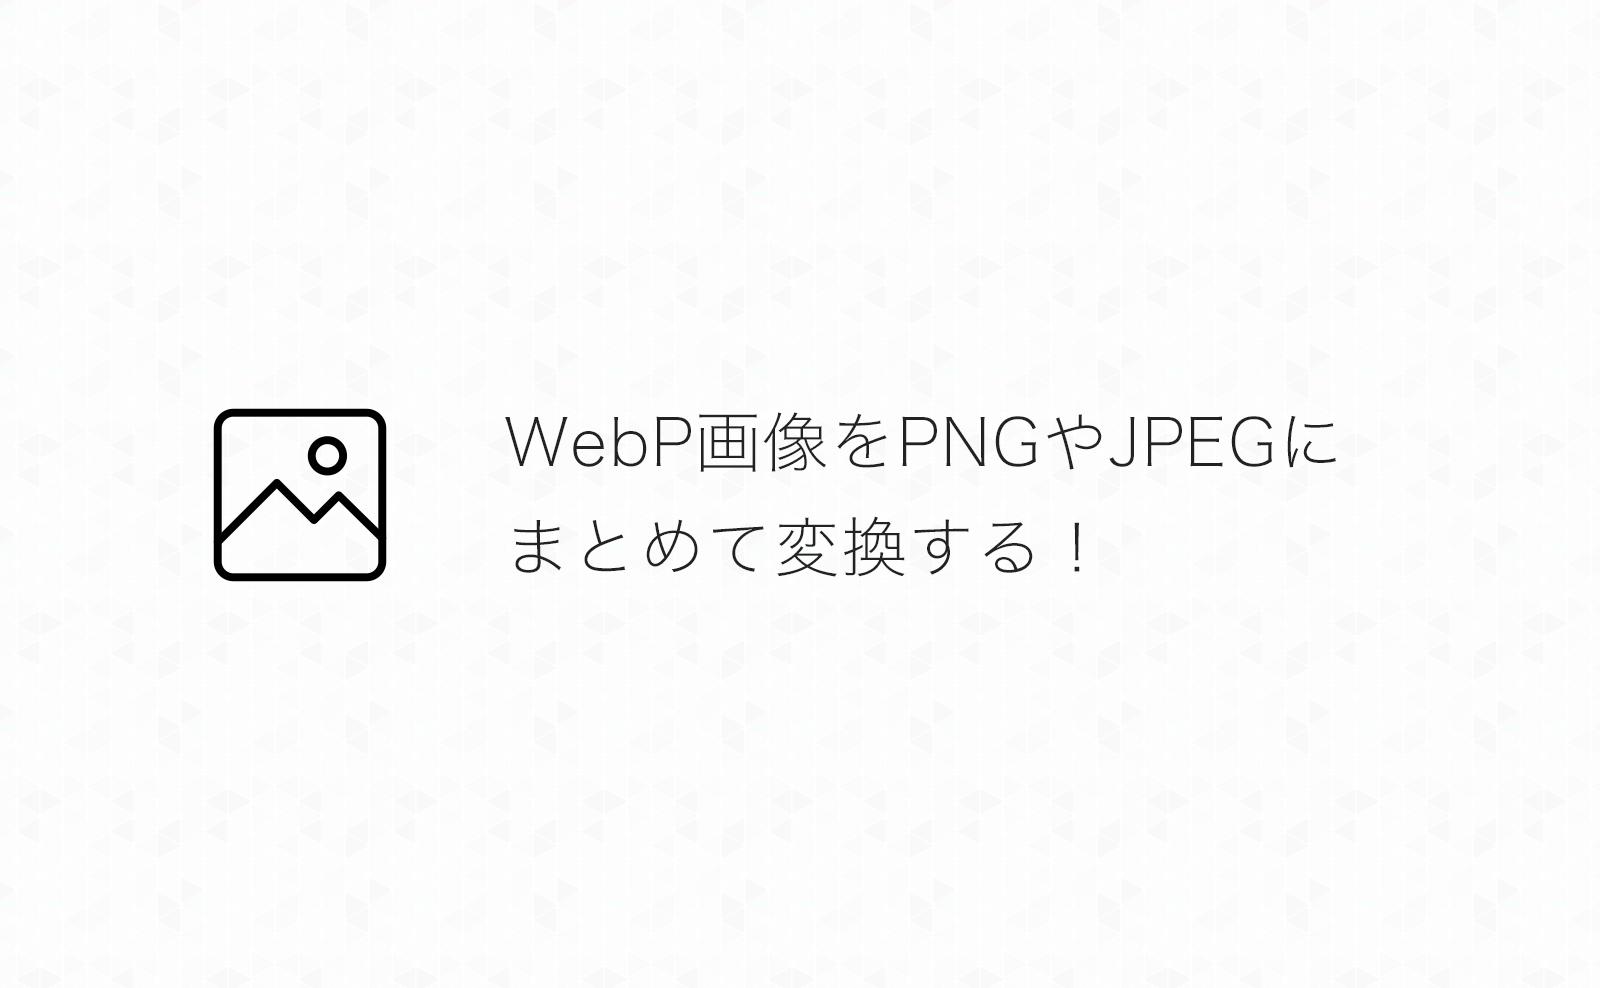 【Mac】WebP画像をPNGやJPEGにまとめて変換する方法